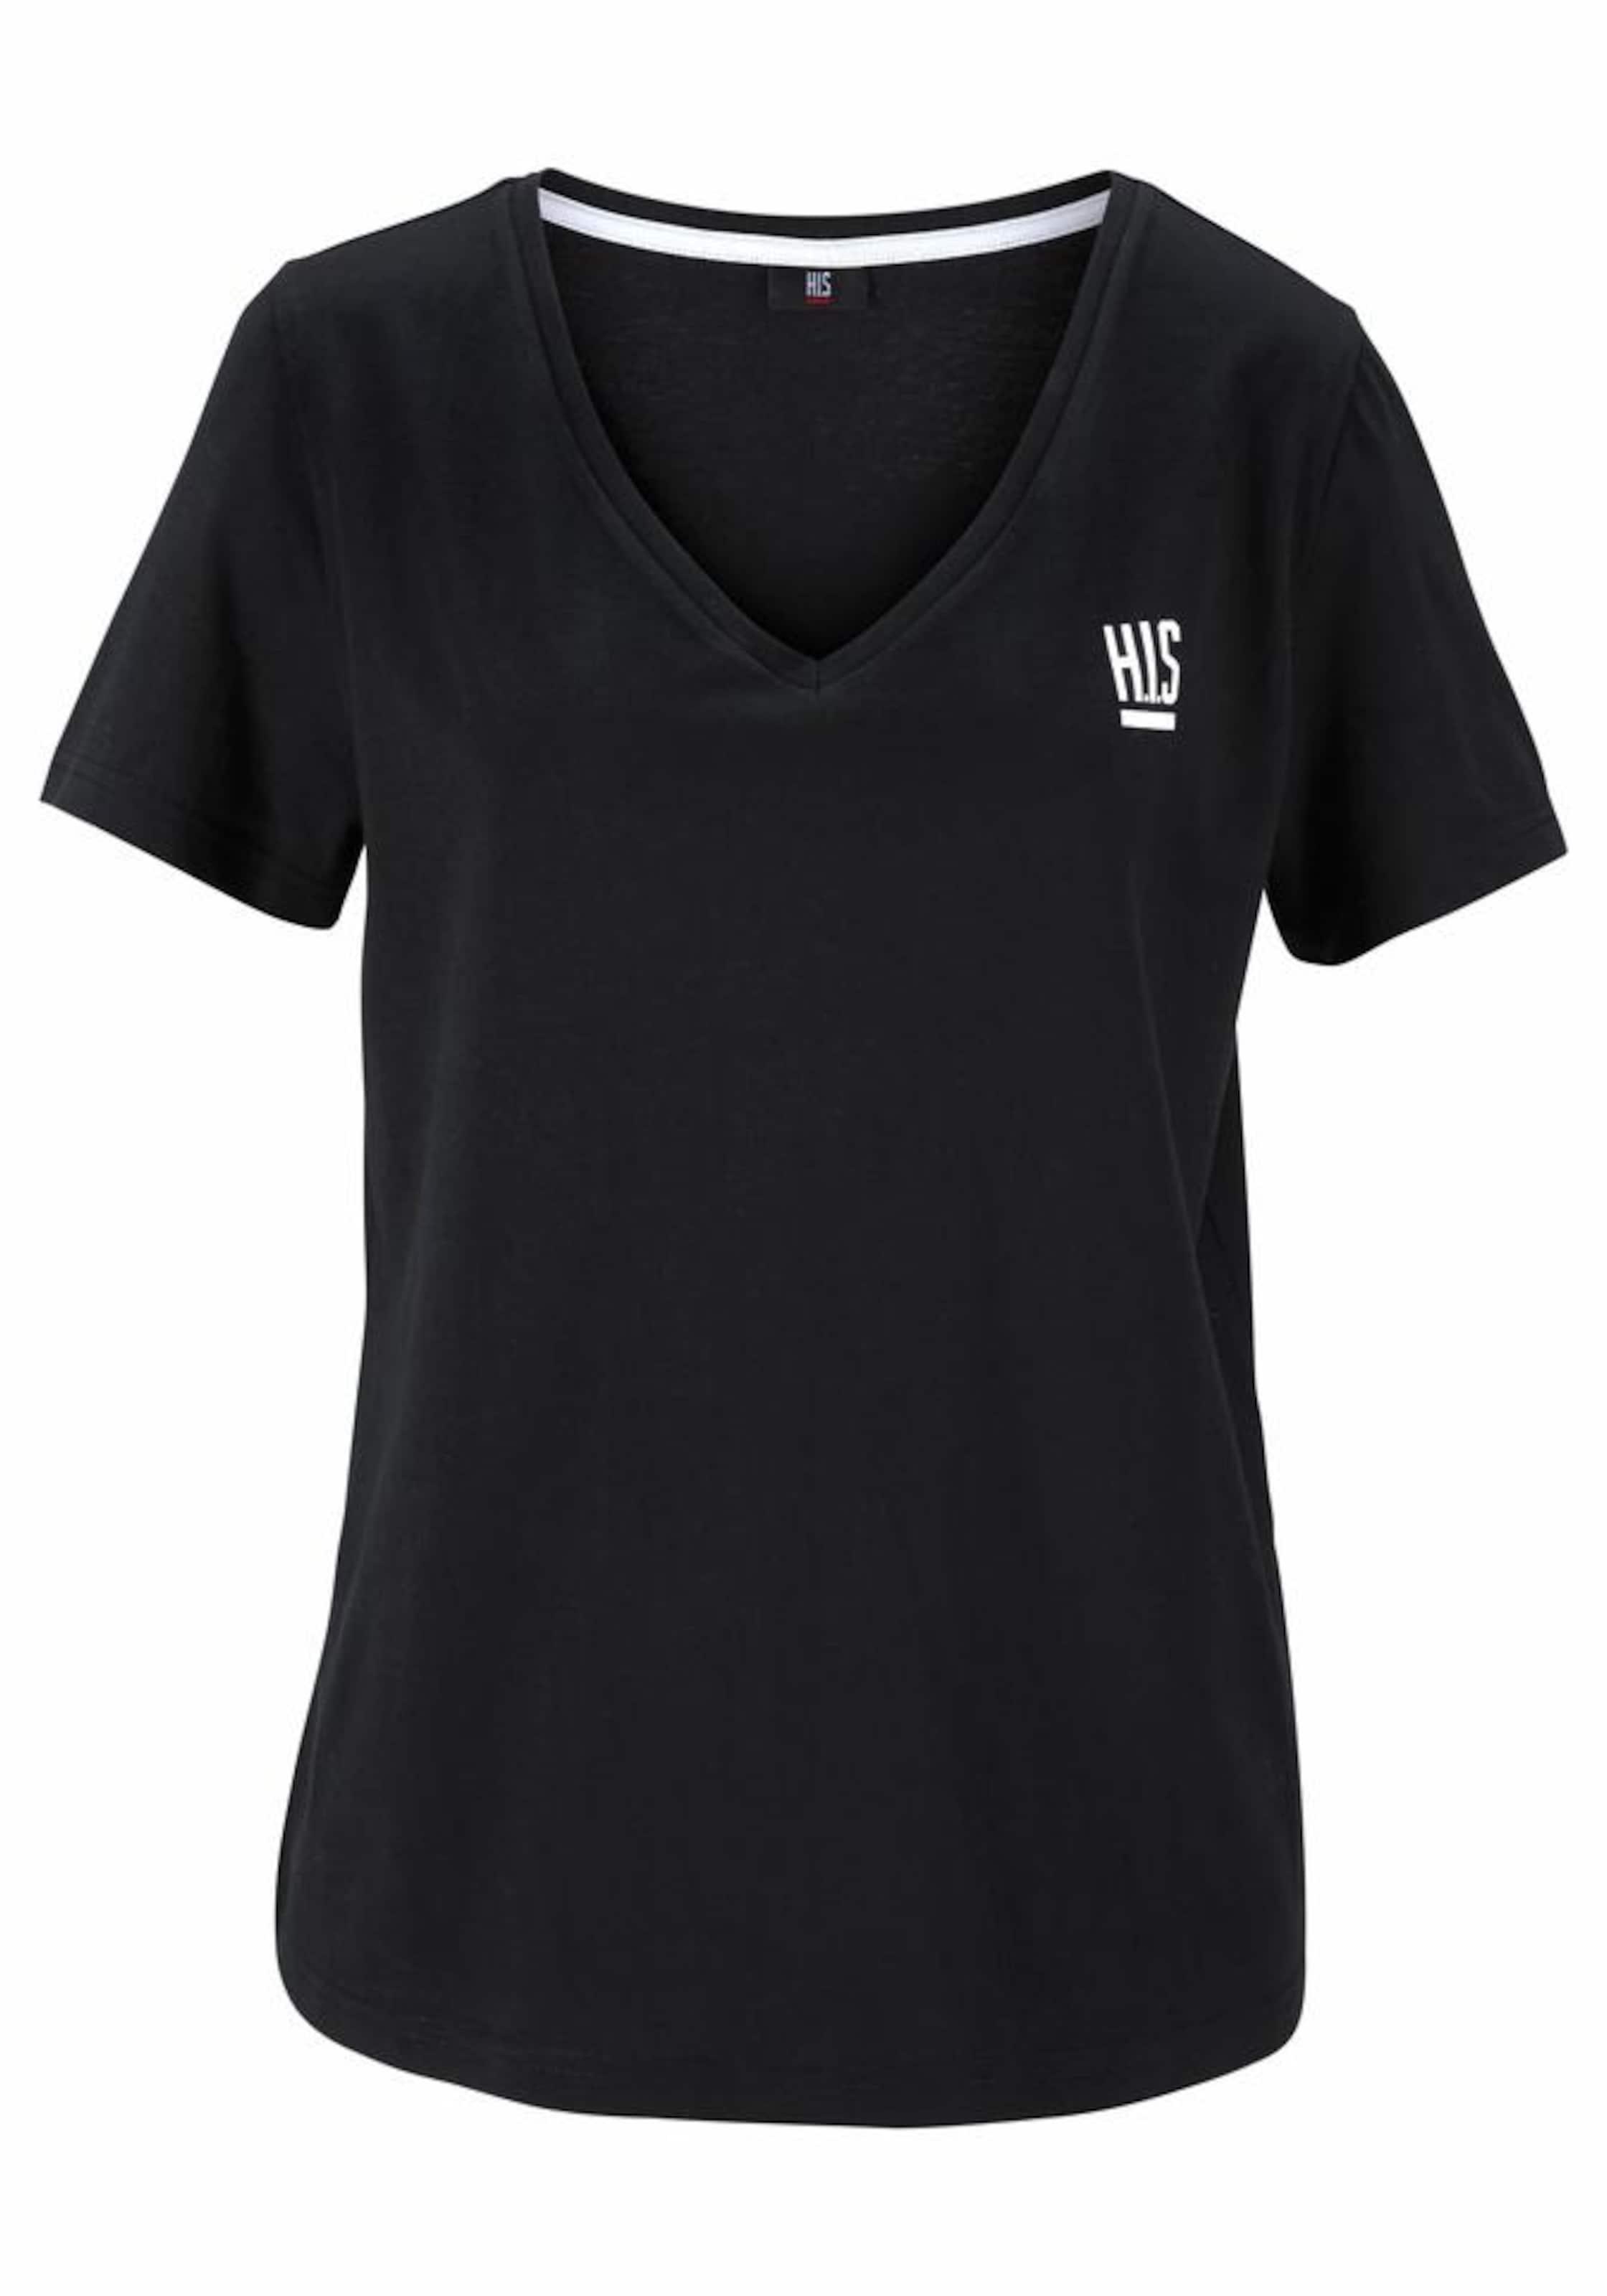 Schwarz PetrolPink s shirts T i H In Y7yvbf6g